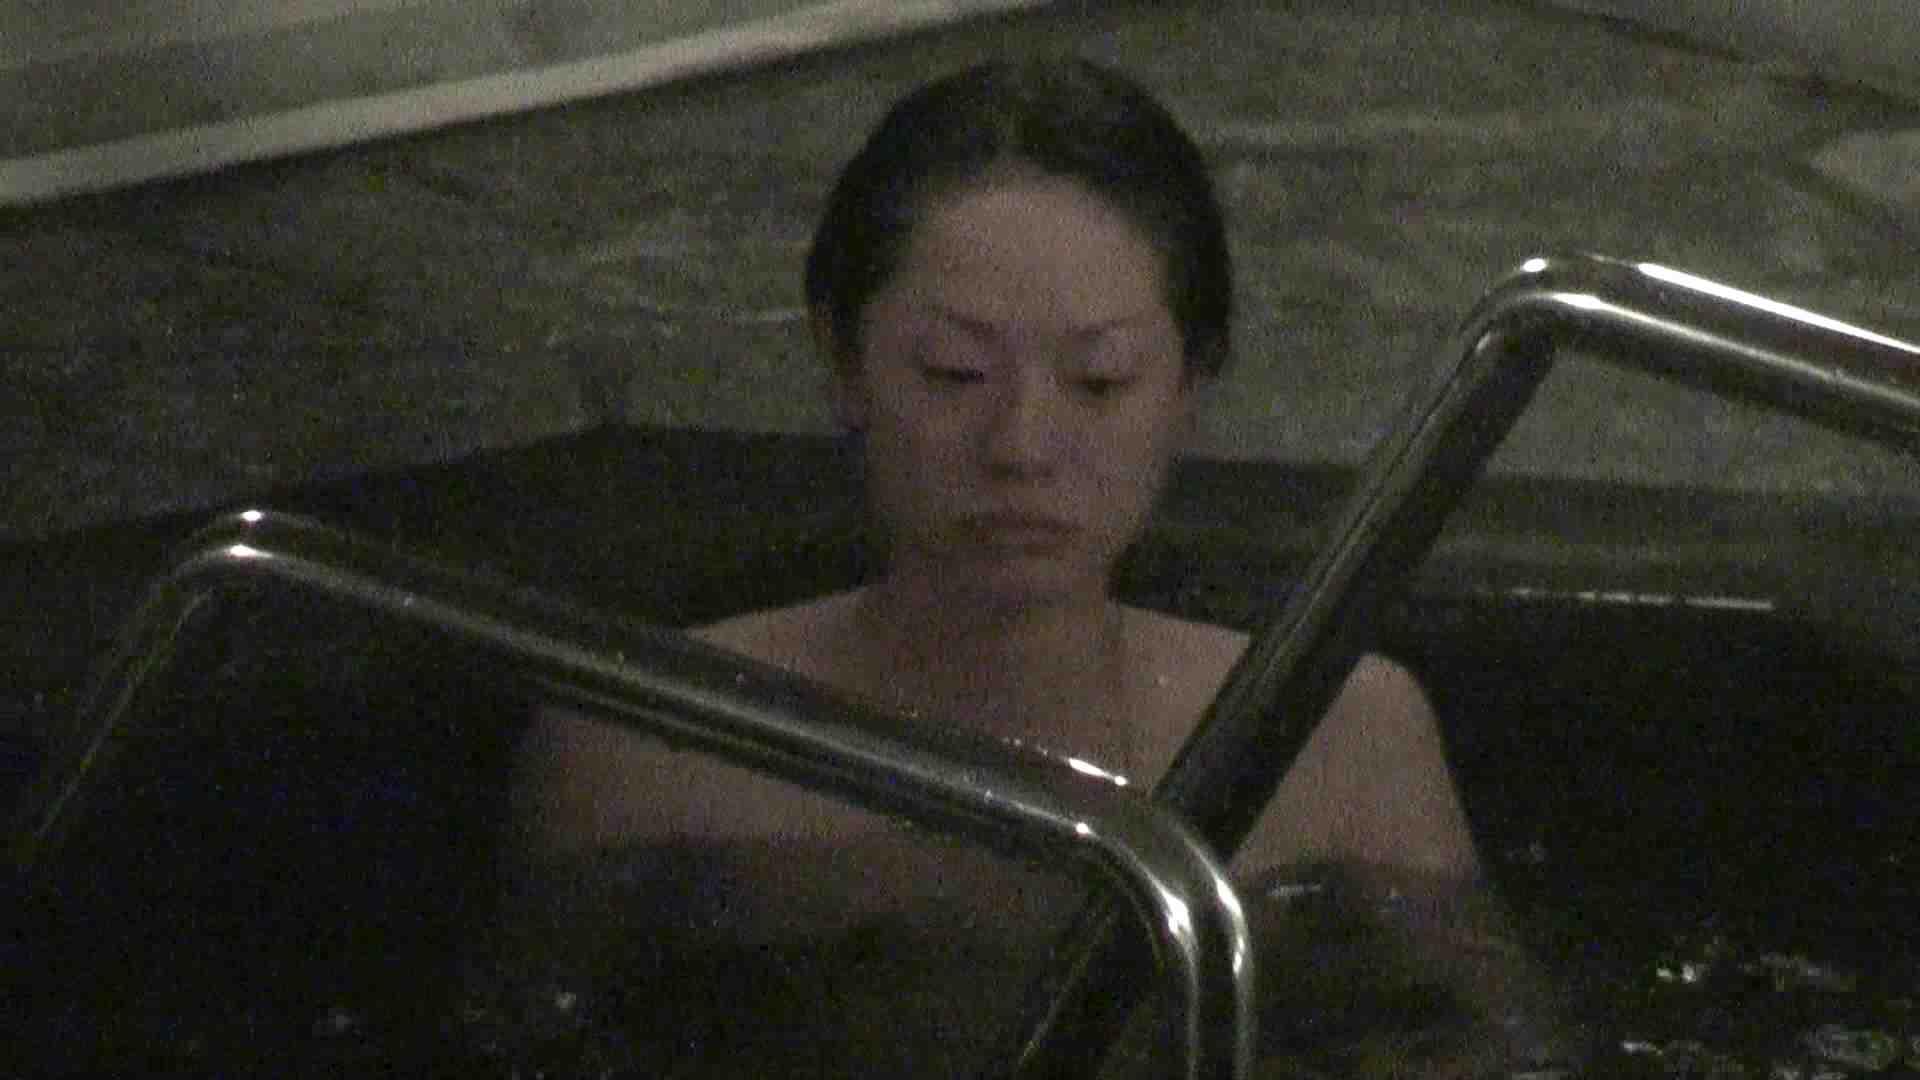 Aquaな露天風呂Vol.318 露天風呂編  109PIX 108